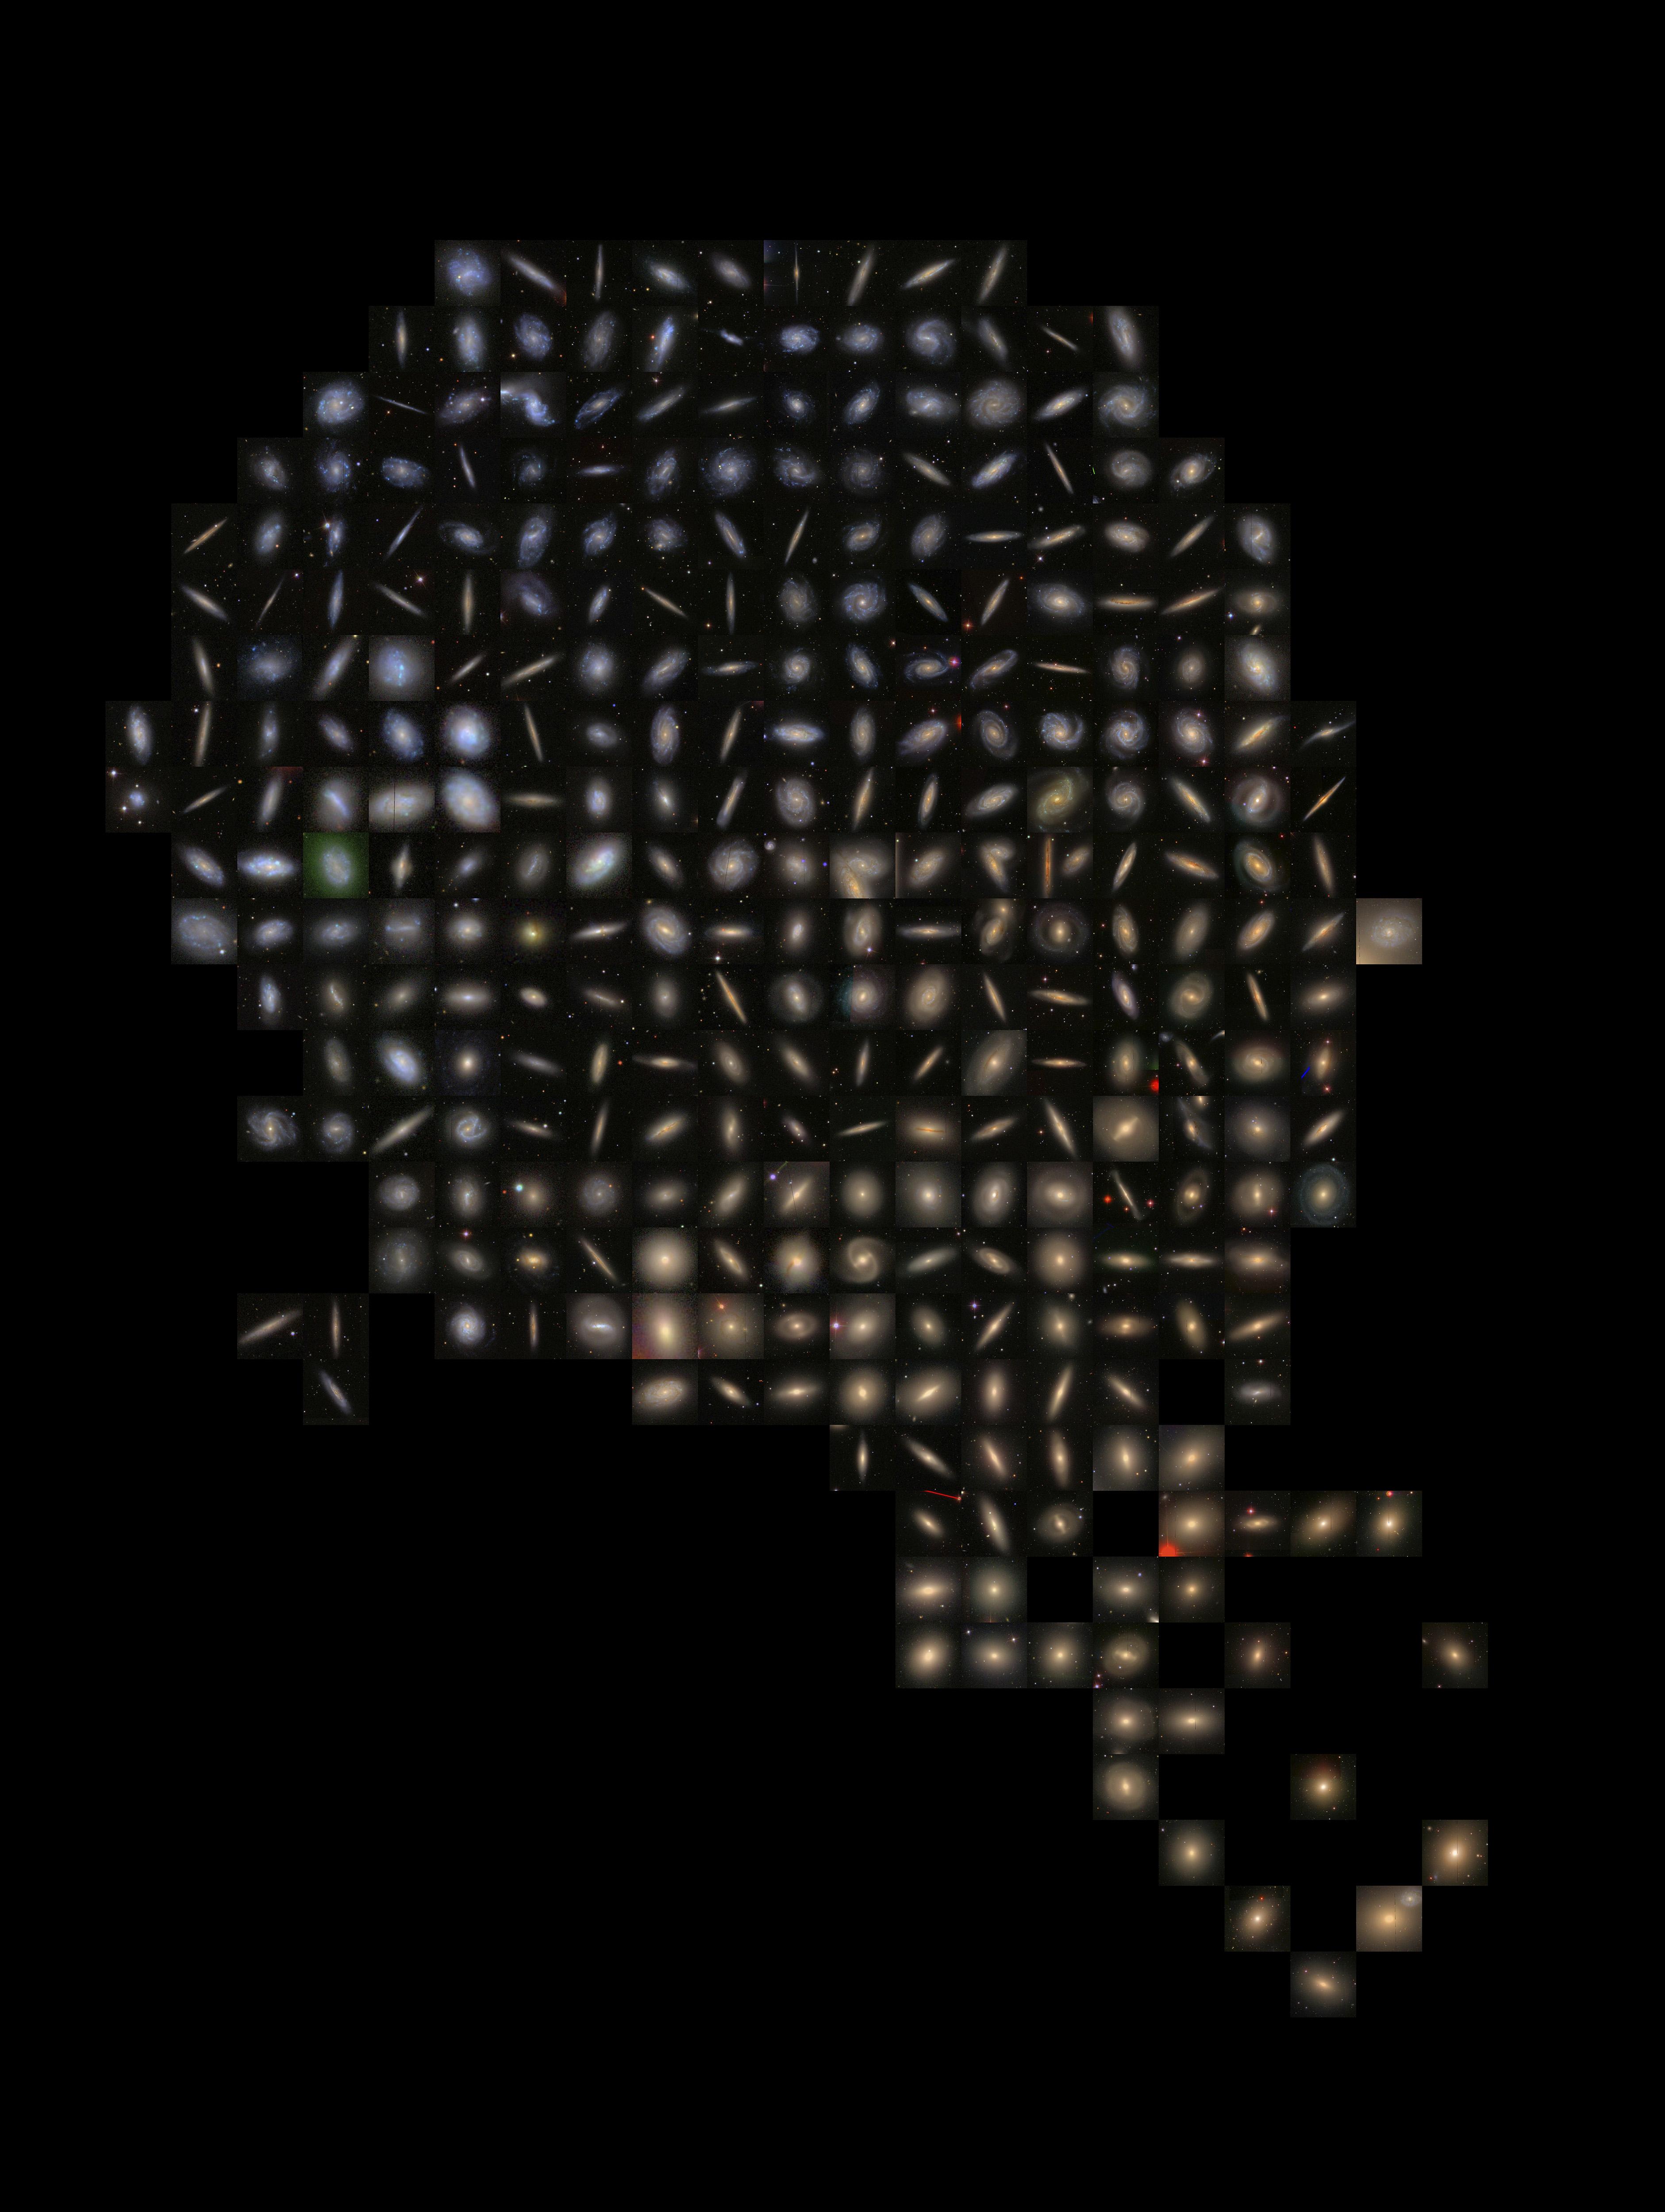 1567216233527-Herschel_Reference_Survey_mosaic_SDSS_4k.jpg